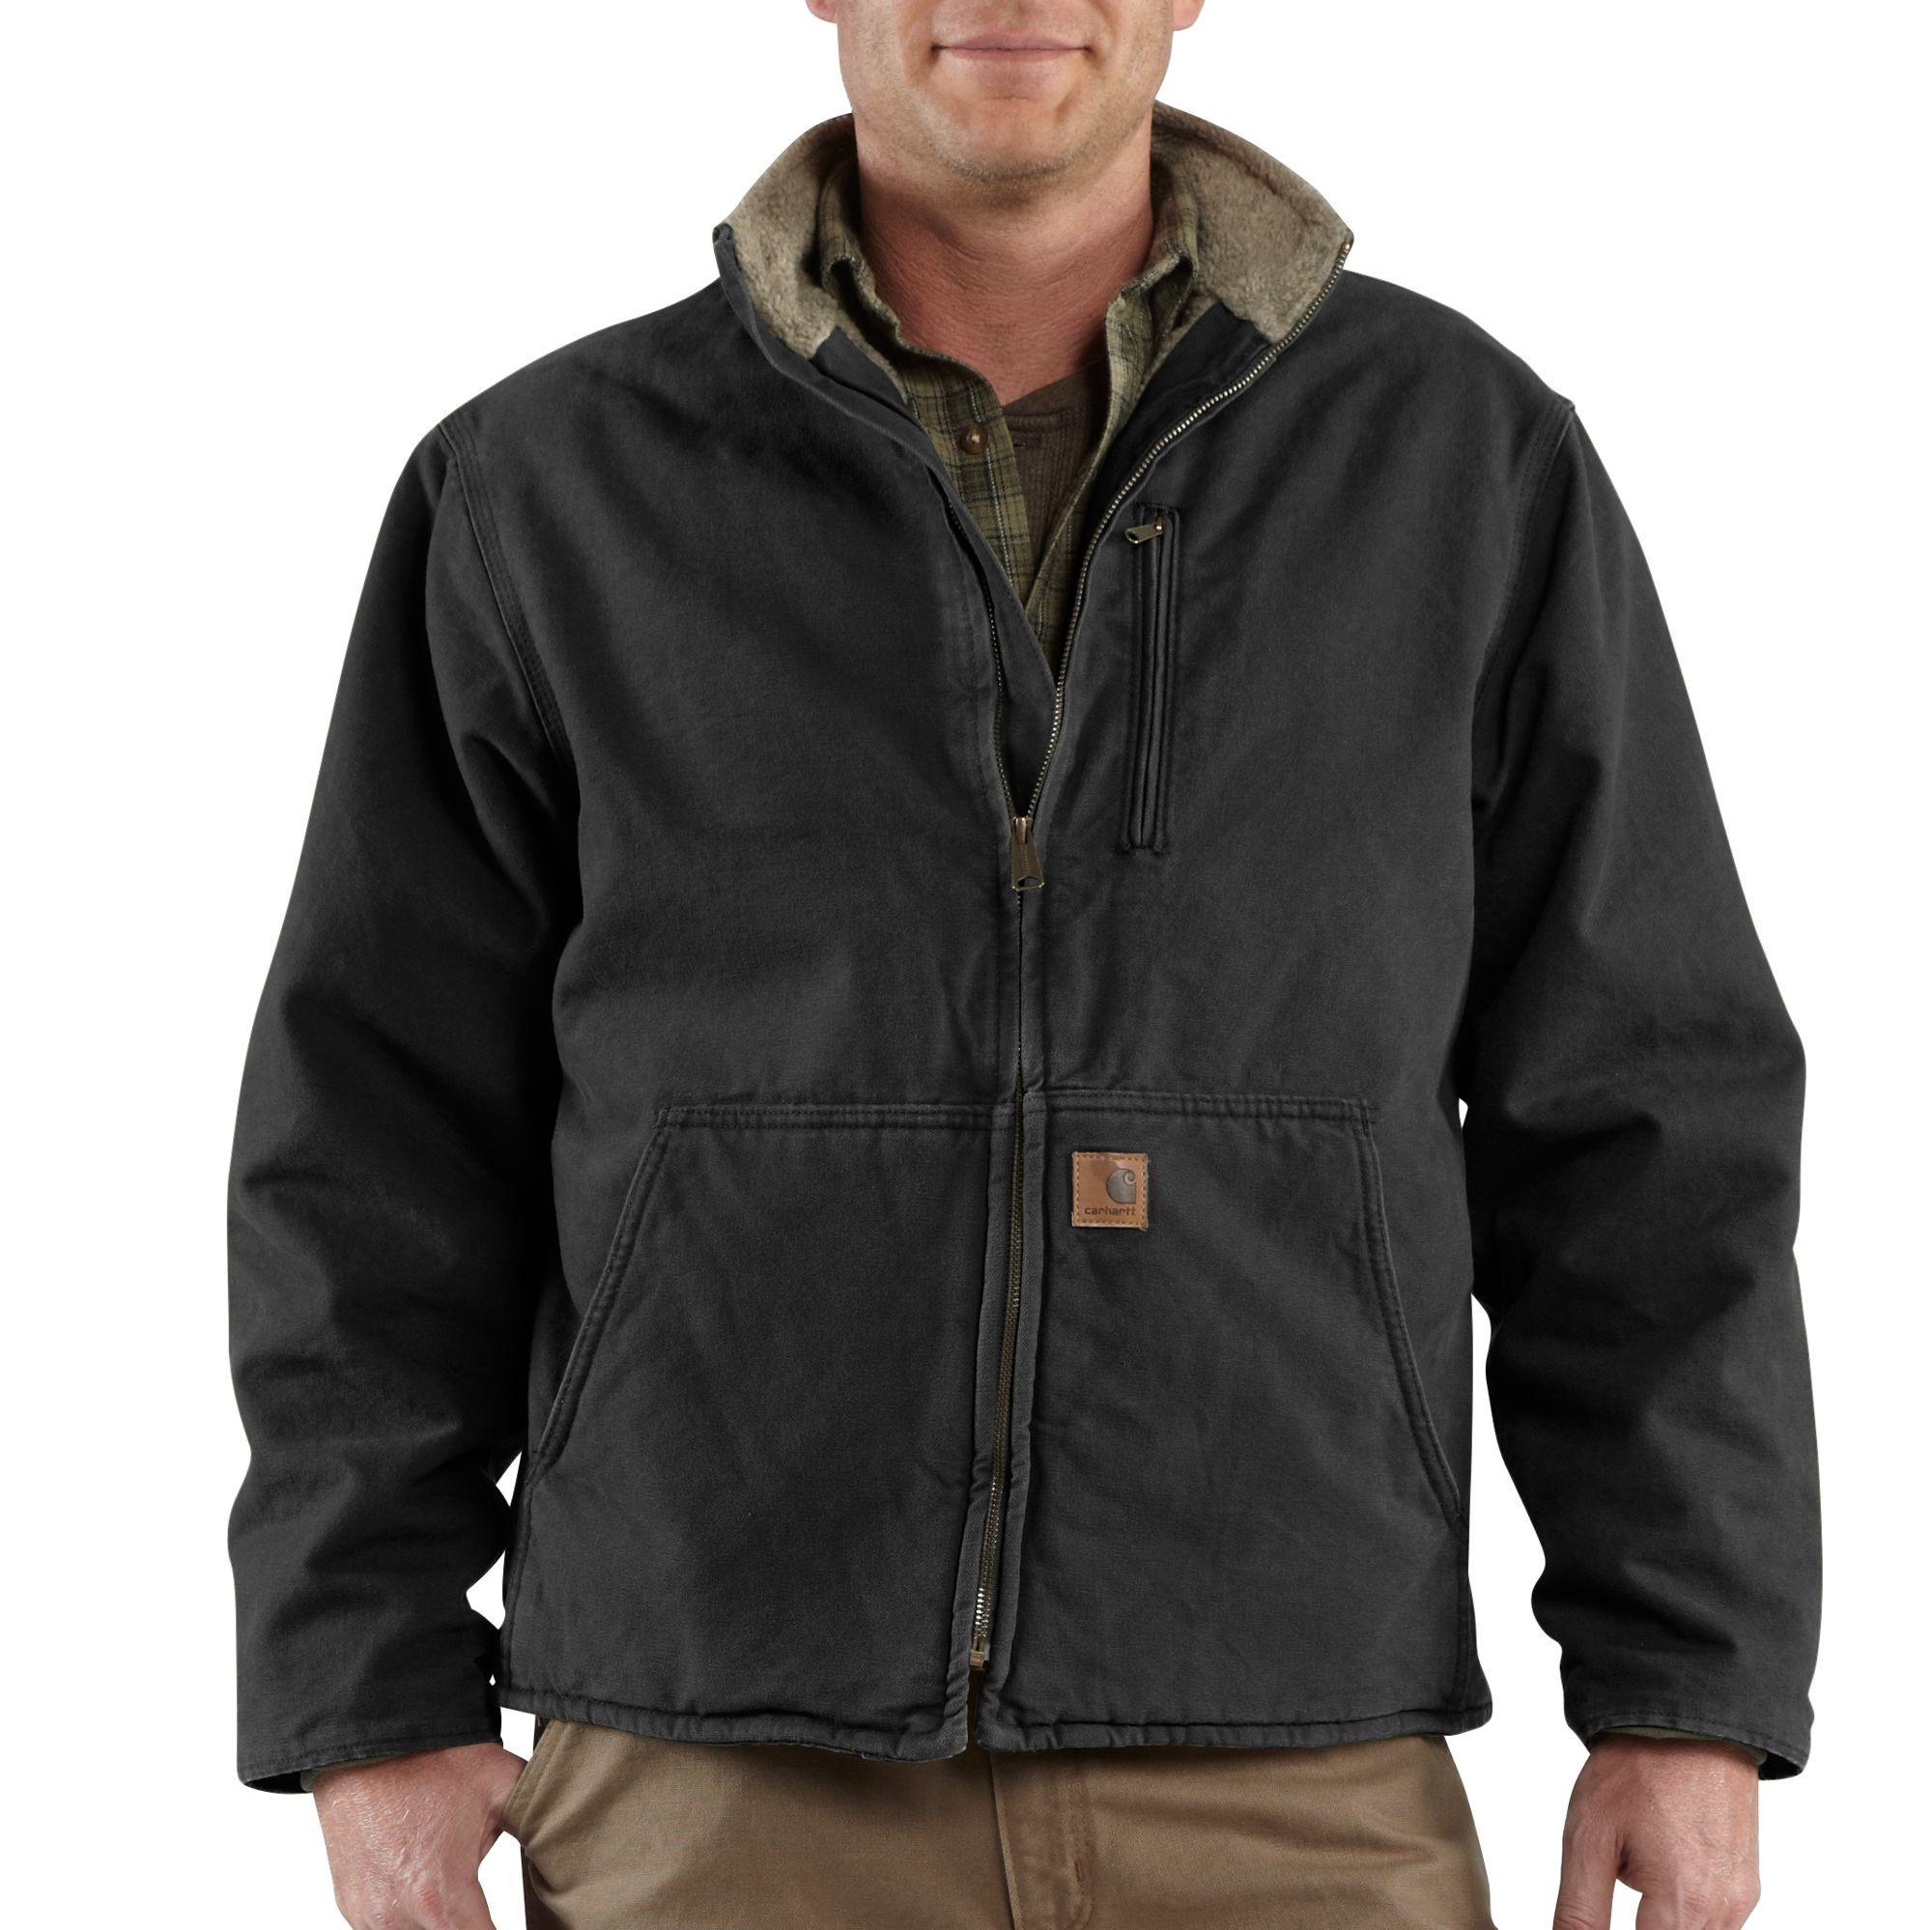 Carhartt Mens Muskegon Jacket Mens Work Outfits Carhartt Mens Jackets [ 1998 x 2000 Pixel ]